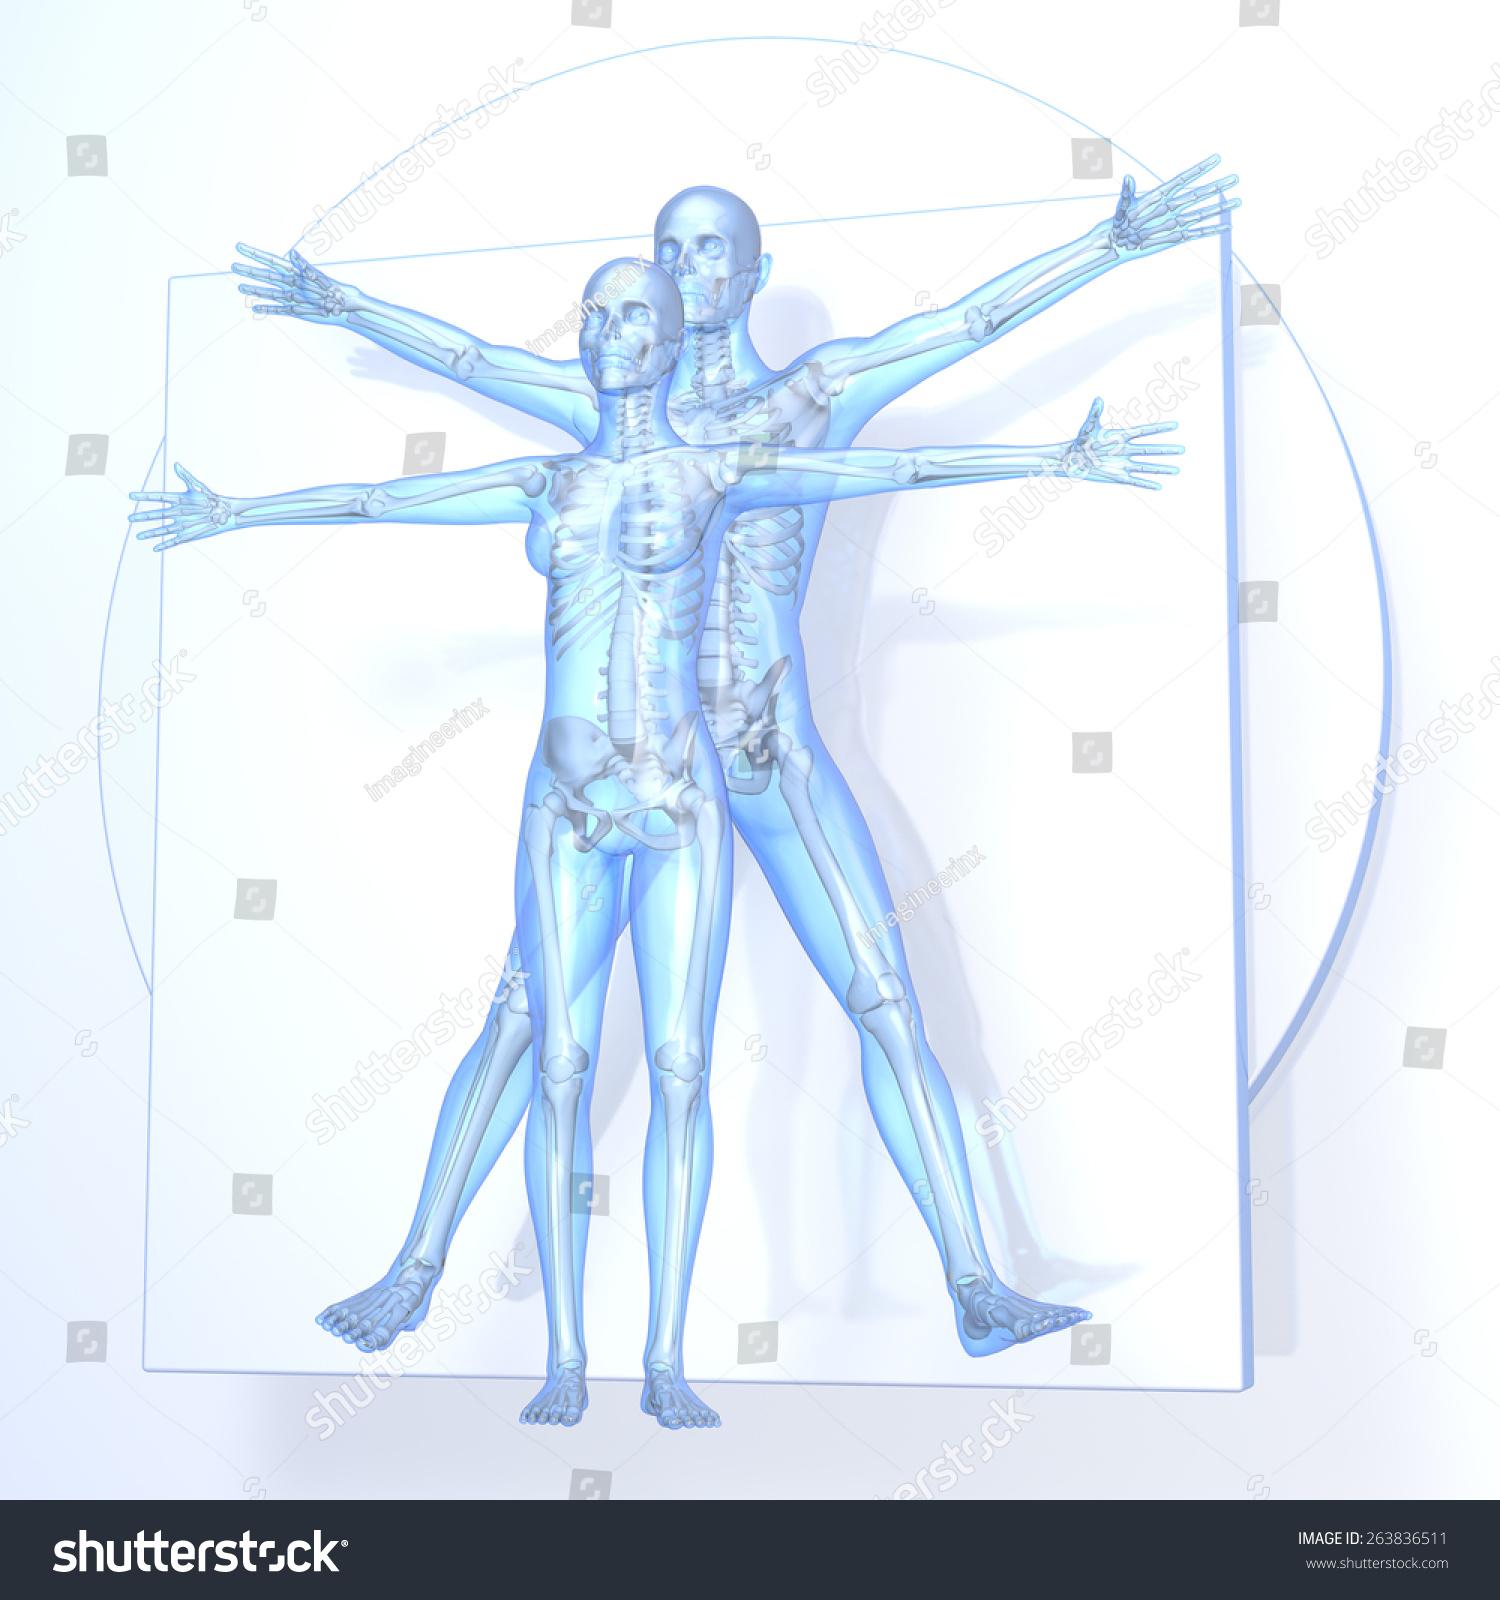 Leonardo Da Vinci Anatomy Discoveries Image collections - human body ...